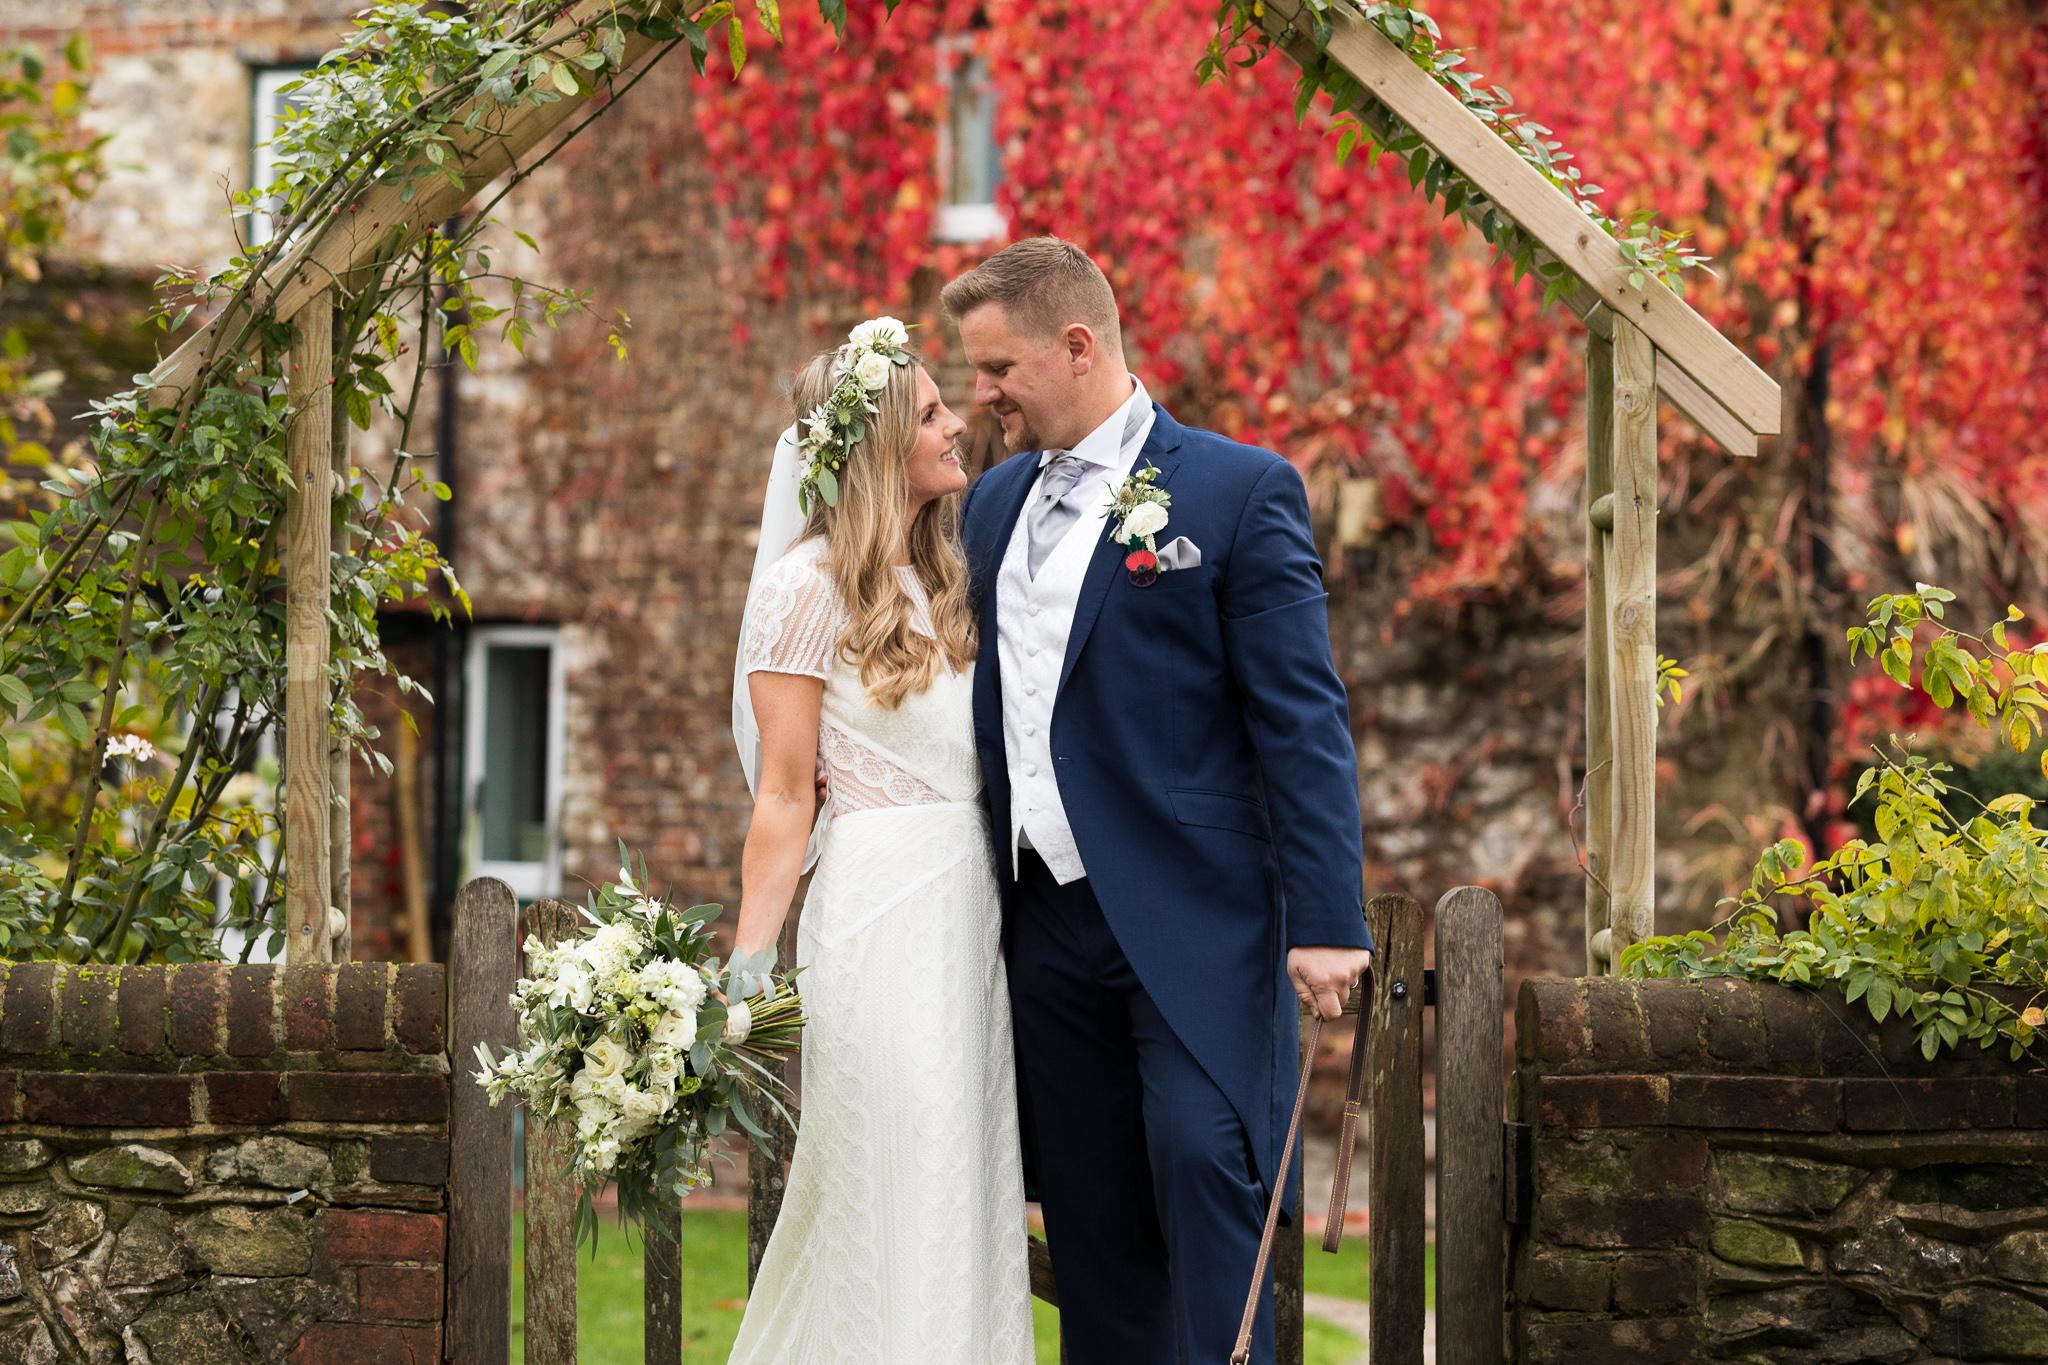 Hampshire_natural_wedding_photography_Rachel_Thornhill_Photographer